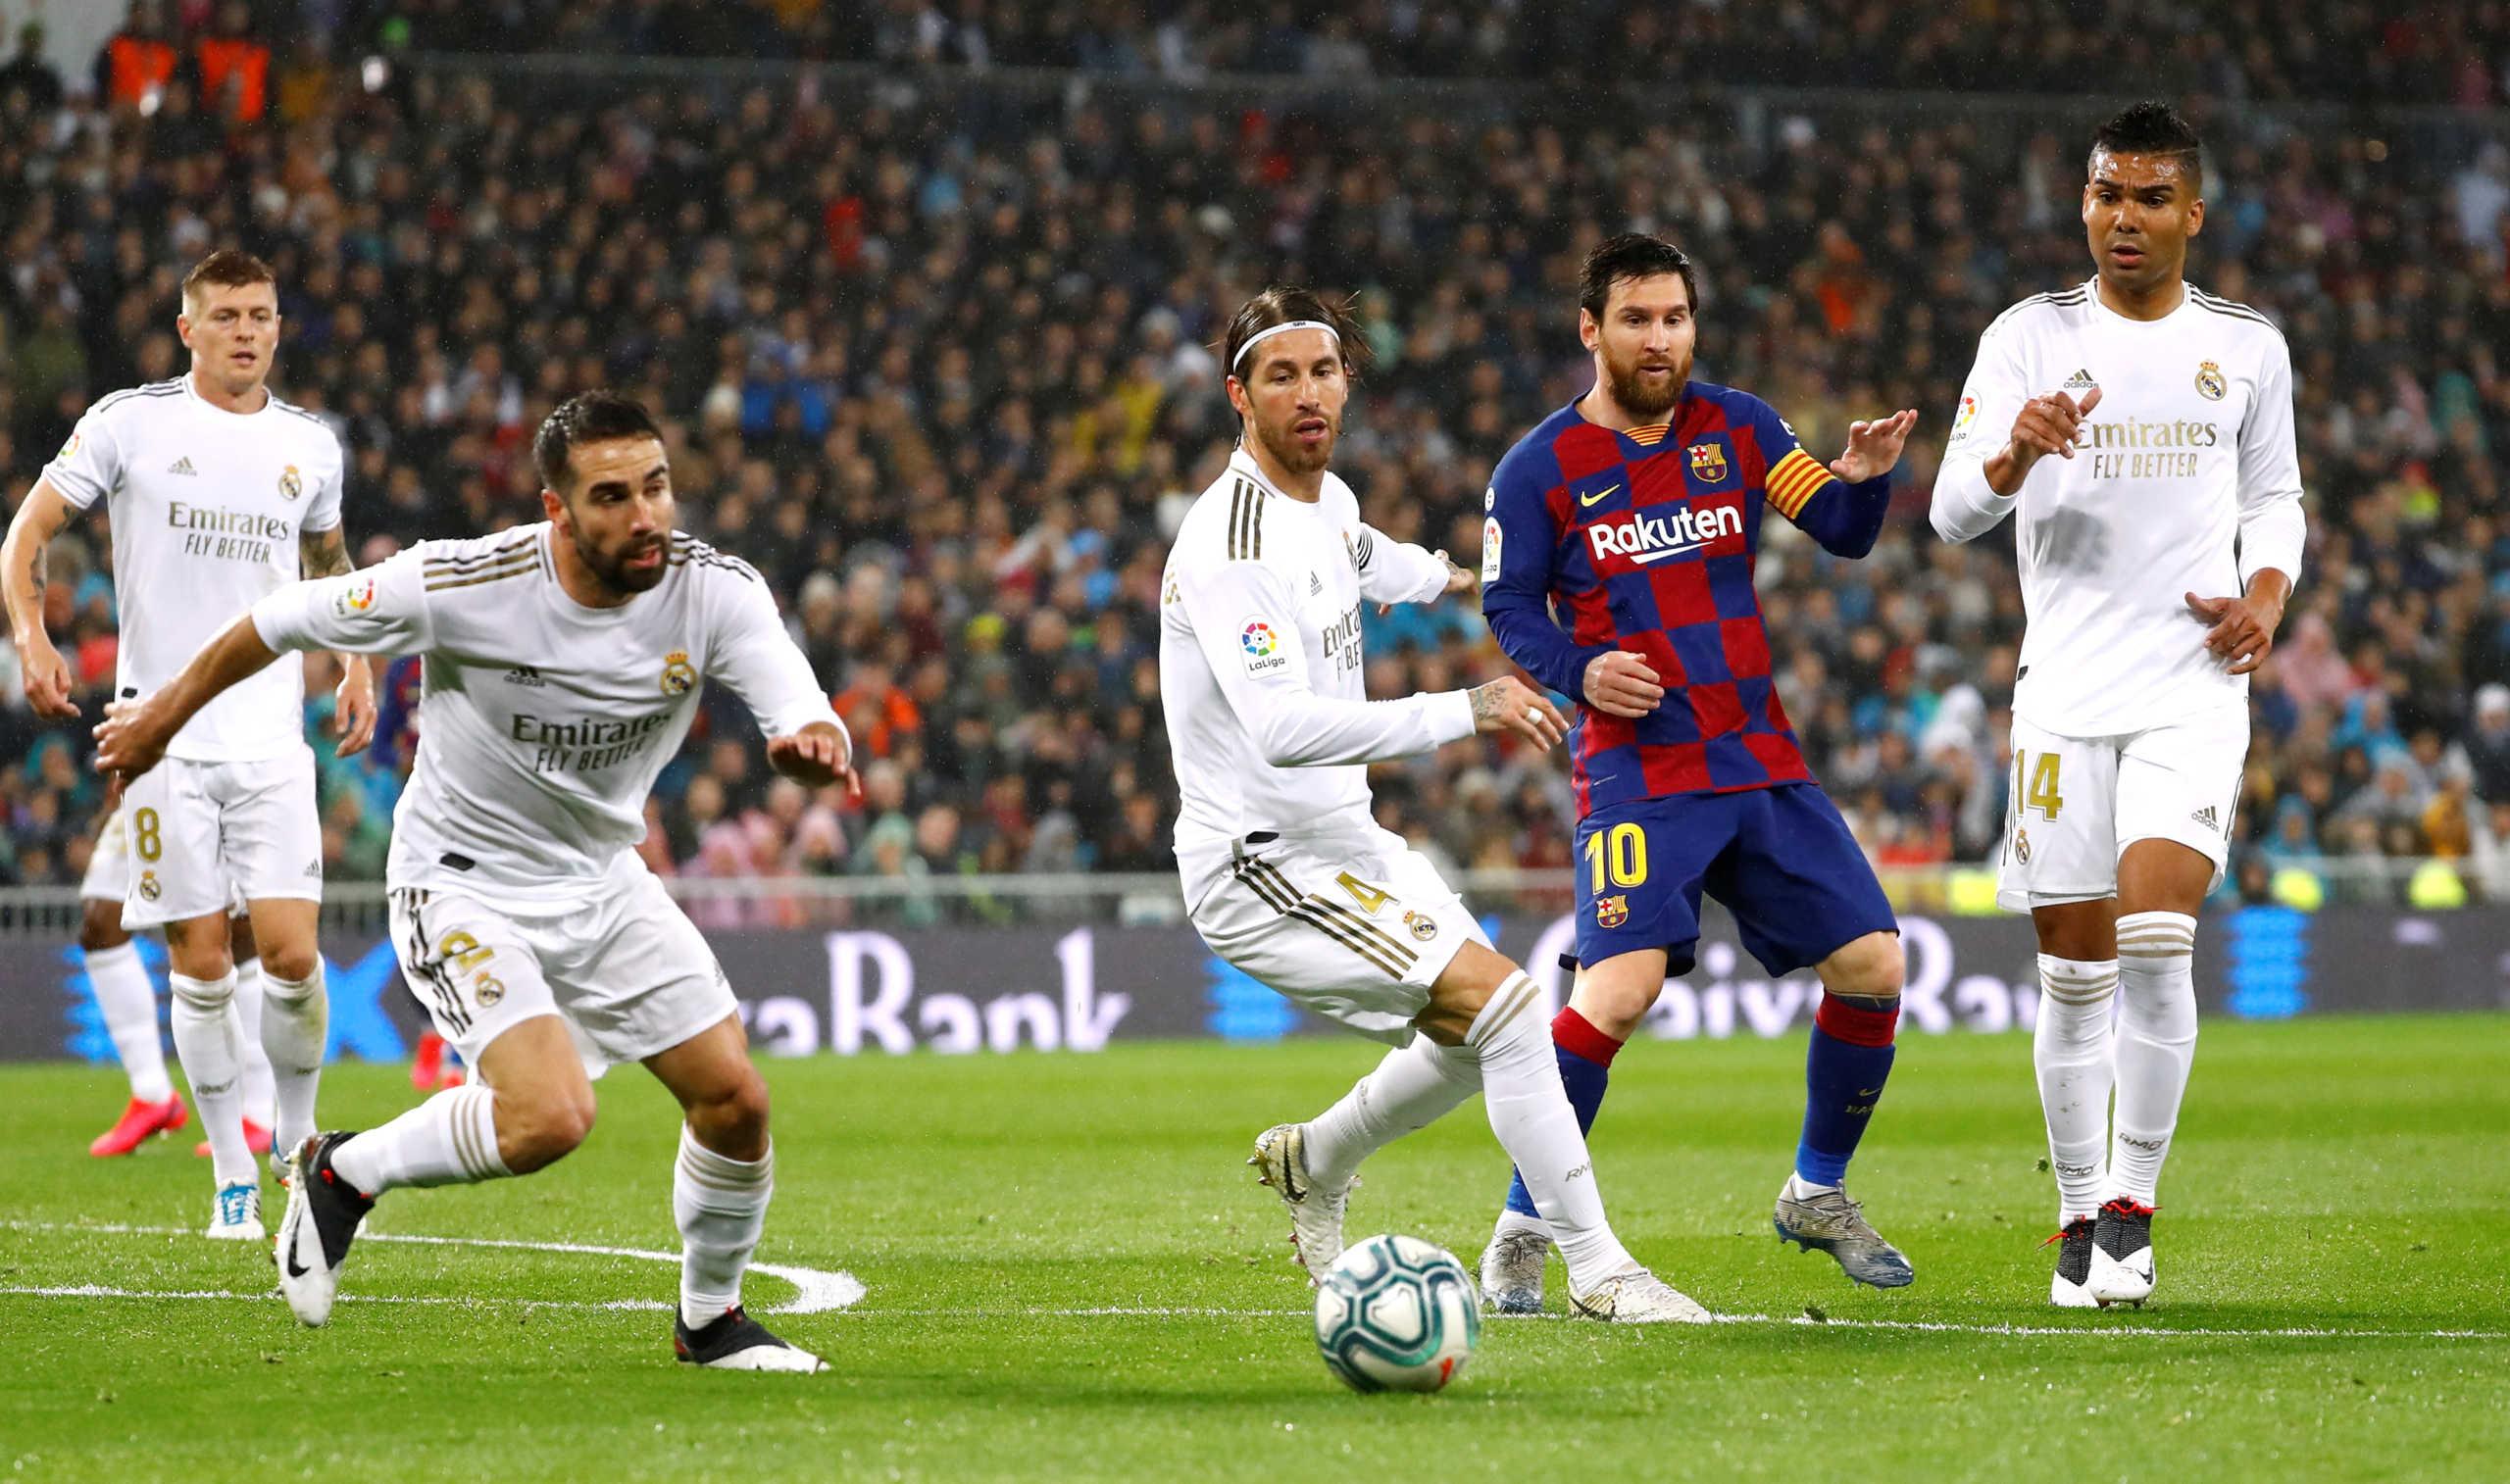 La Liga: Επανέναρξη μέχρι τις 27 Ιουνίου αλλιώς οριστικό τέλος στη σεζόν!